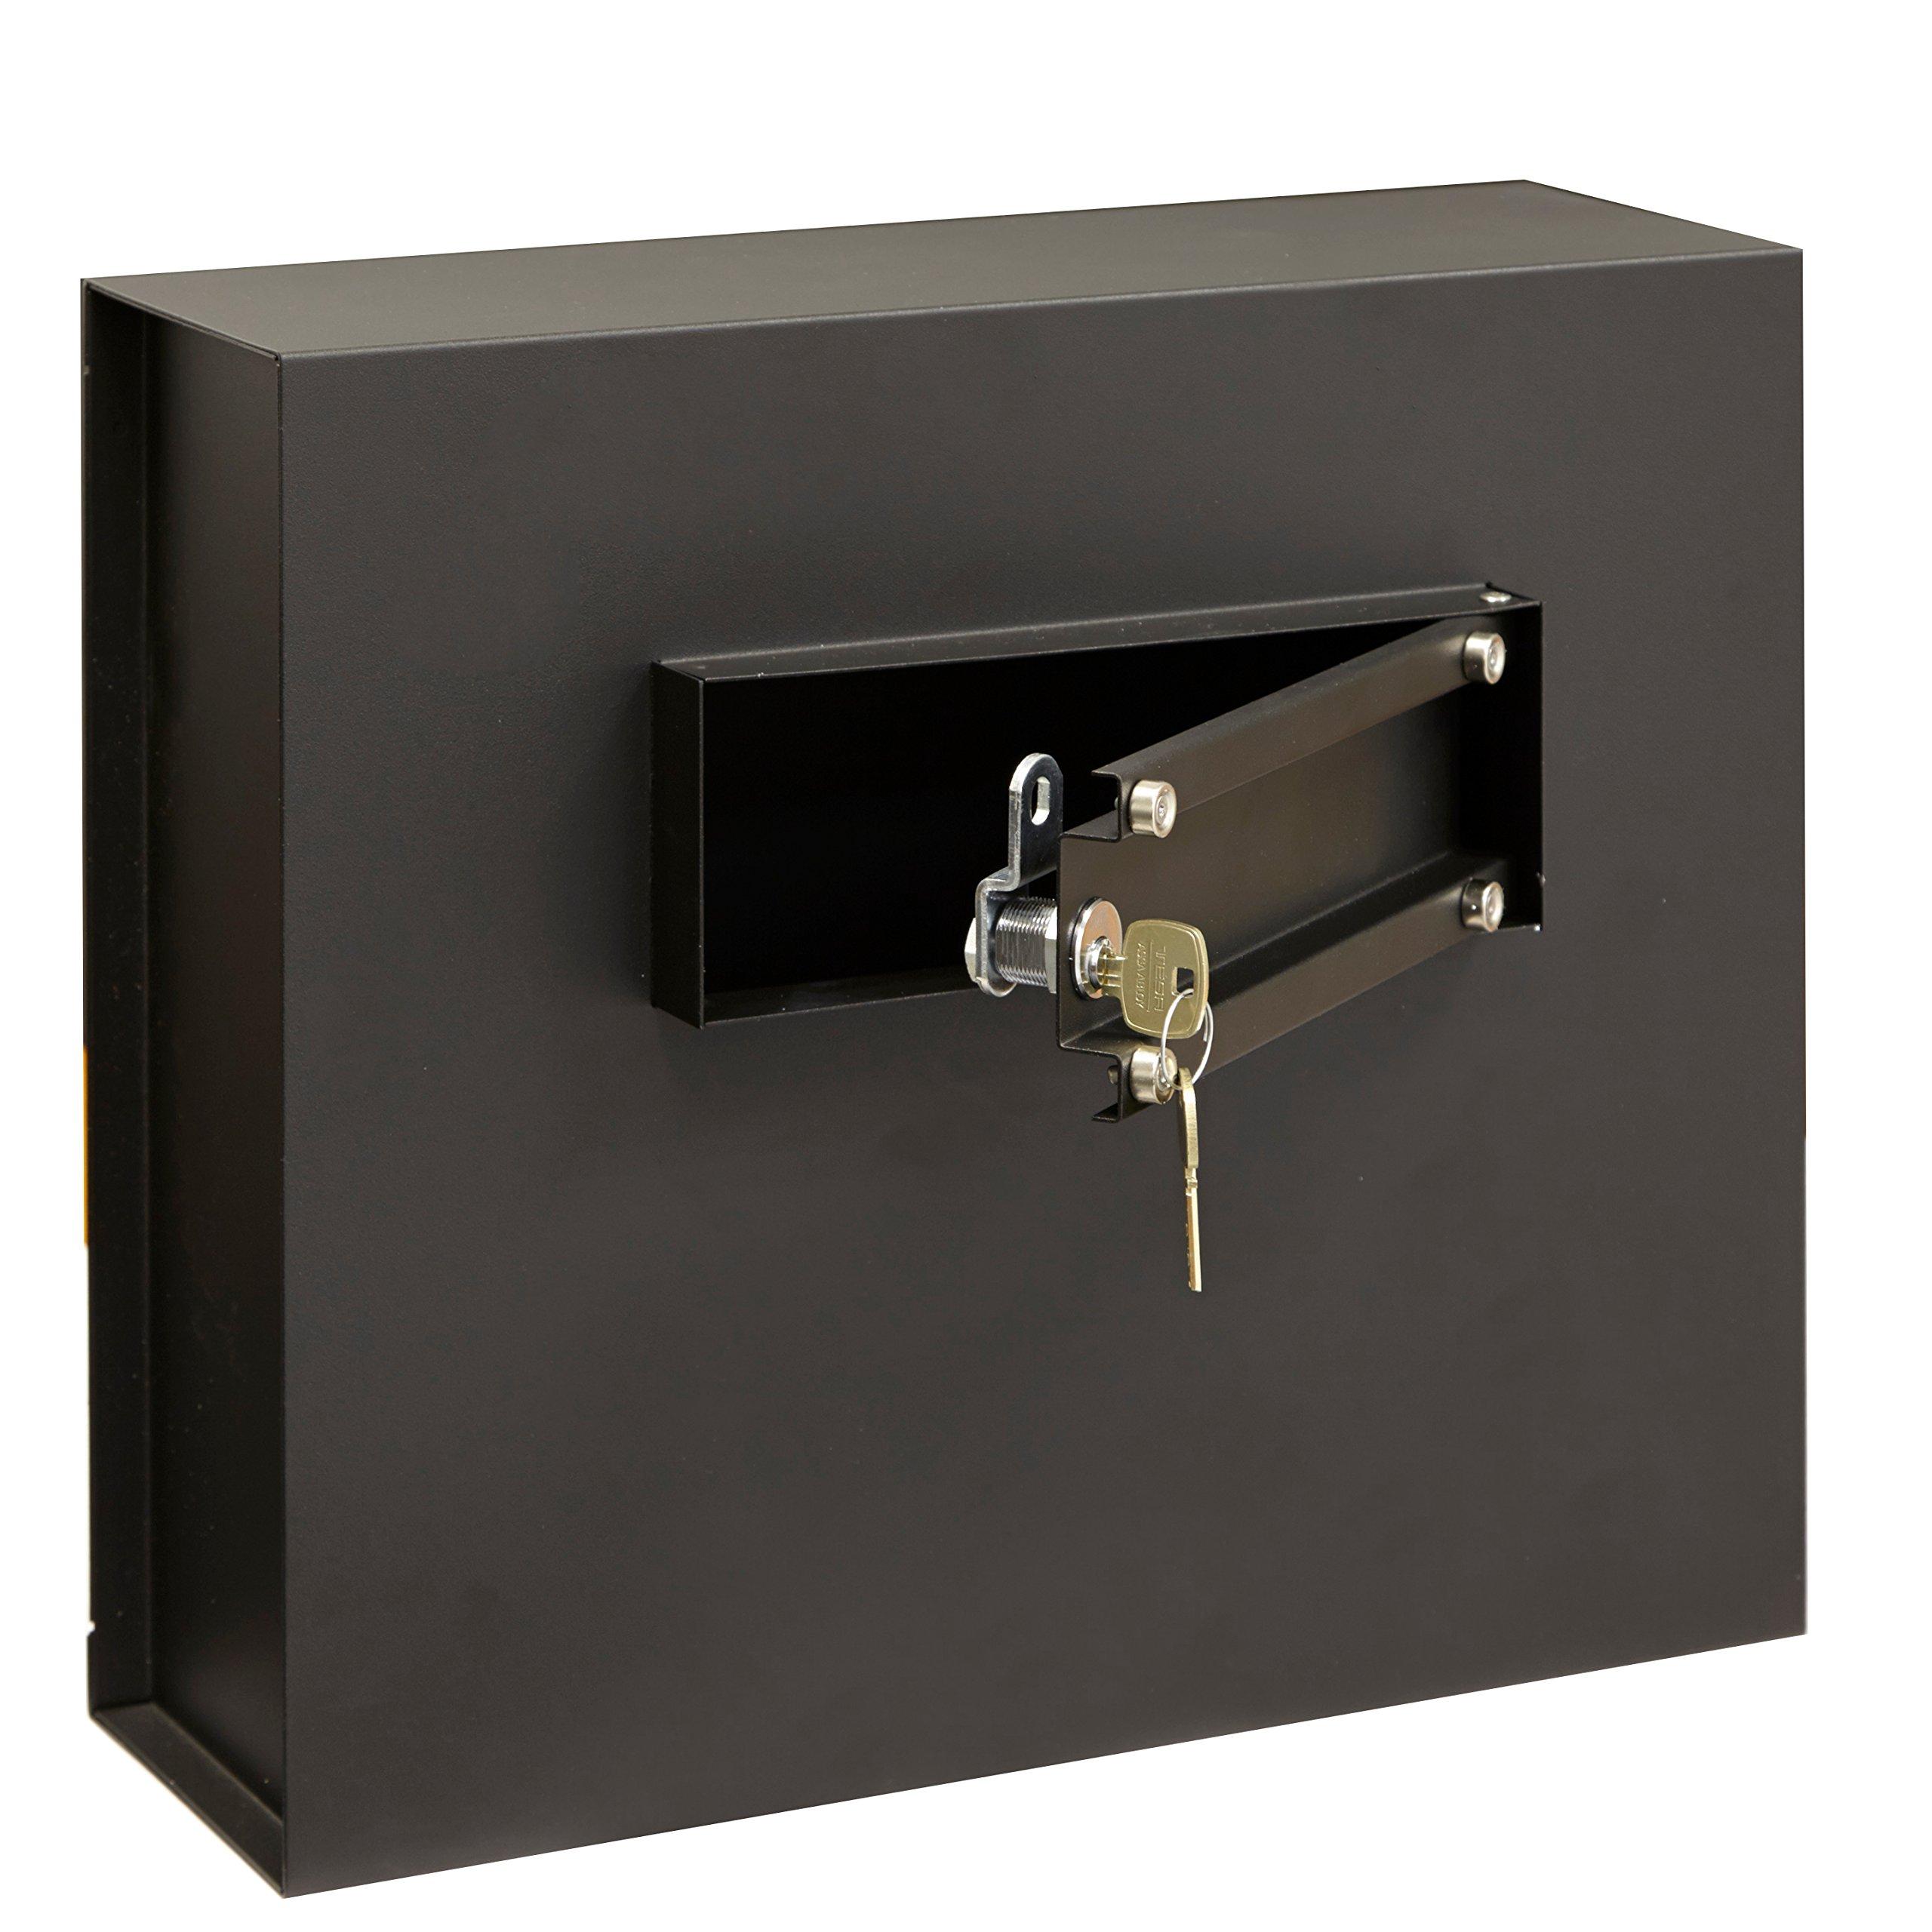 Arregui Caja Fuerte camuflada para Rejilla Enchufe Color Negro ...